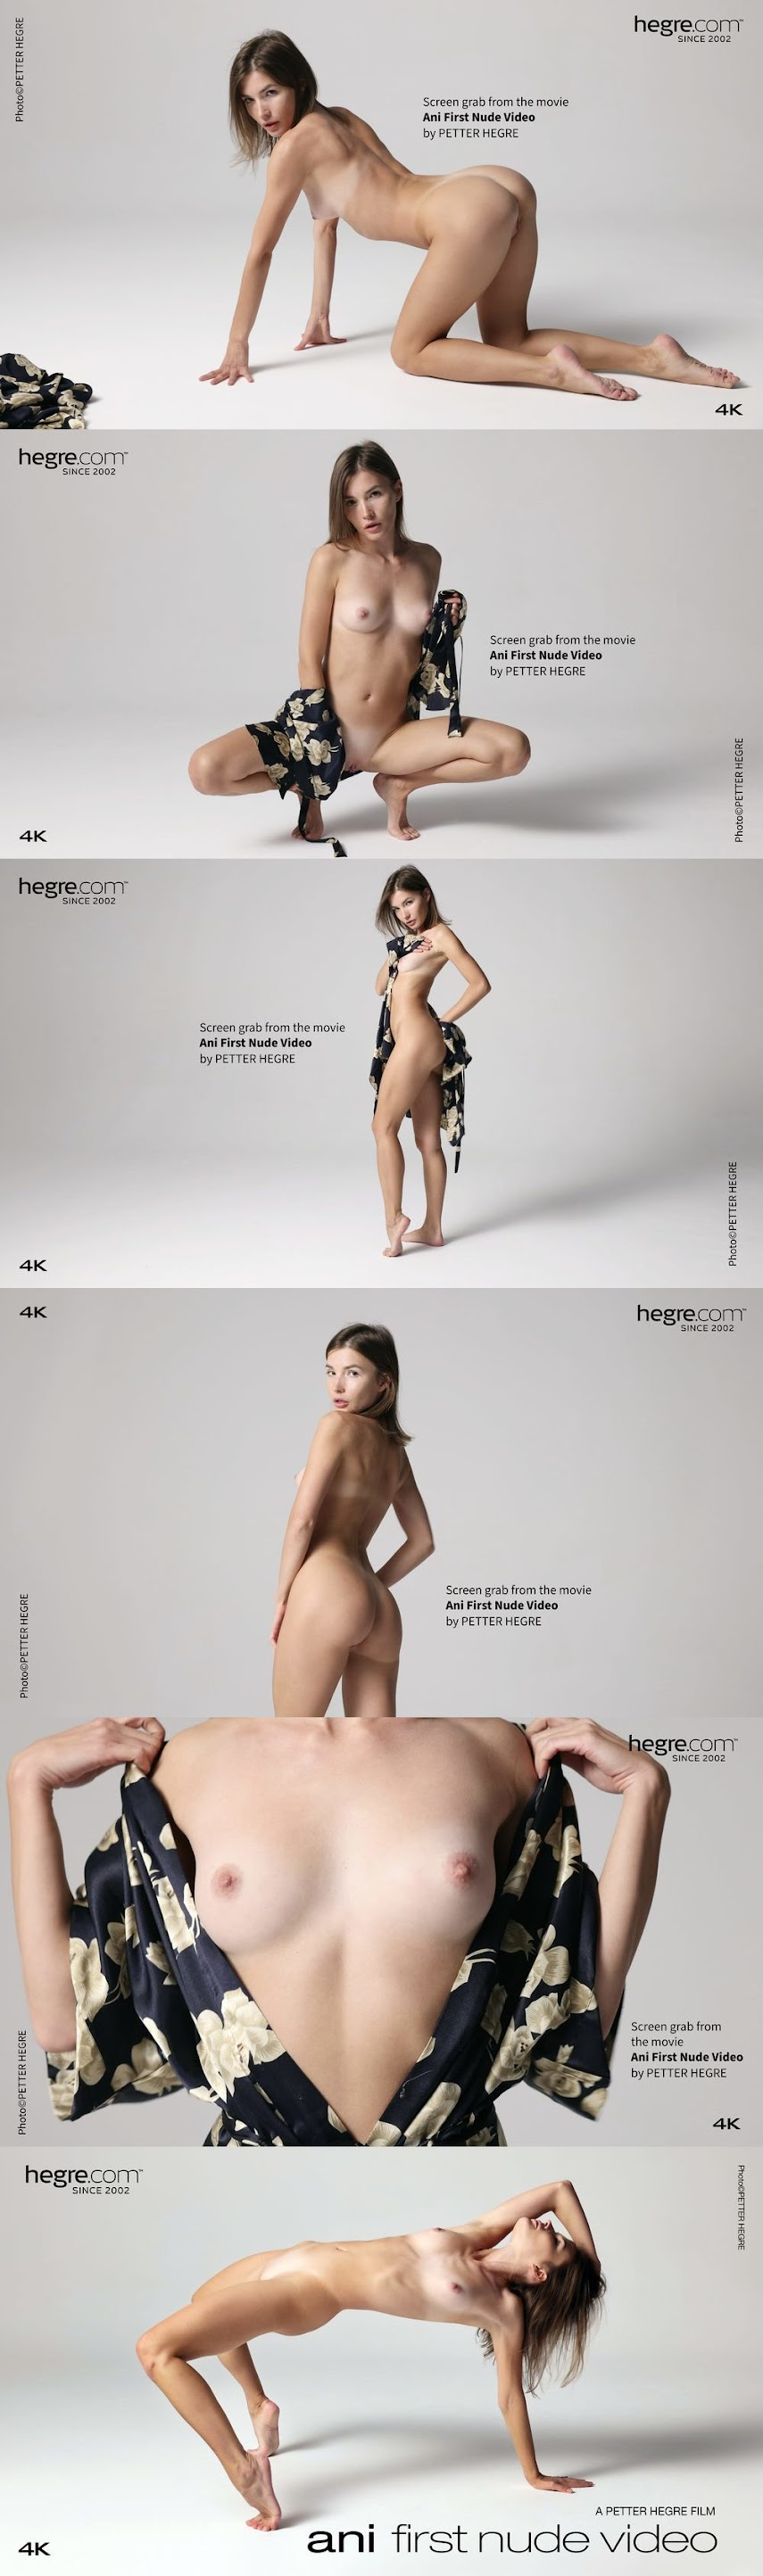 [Art] Ani - First Nude Video art 10070